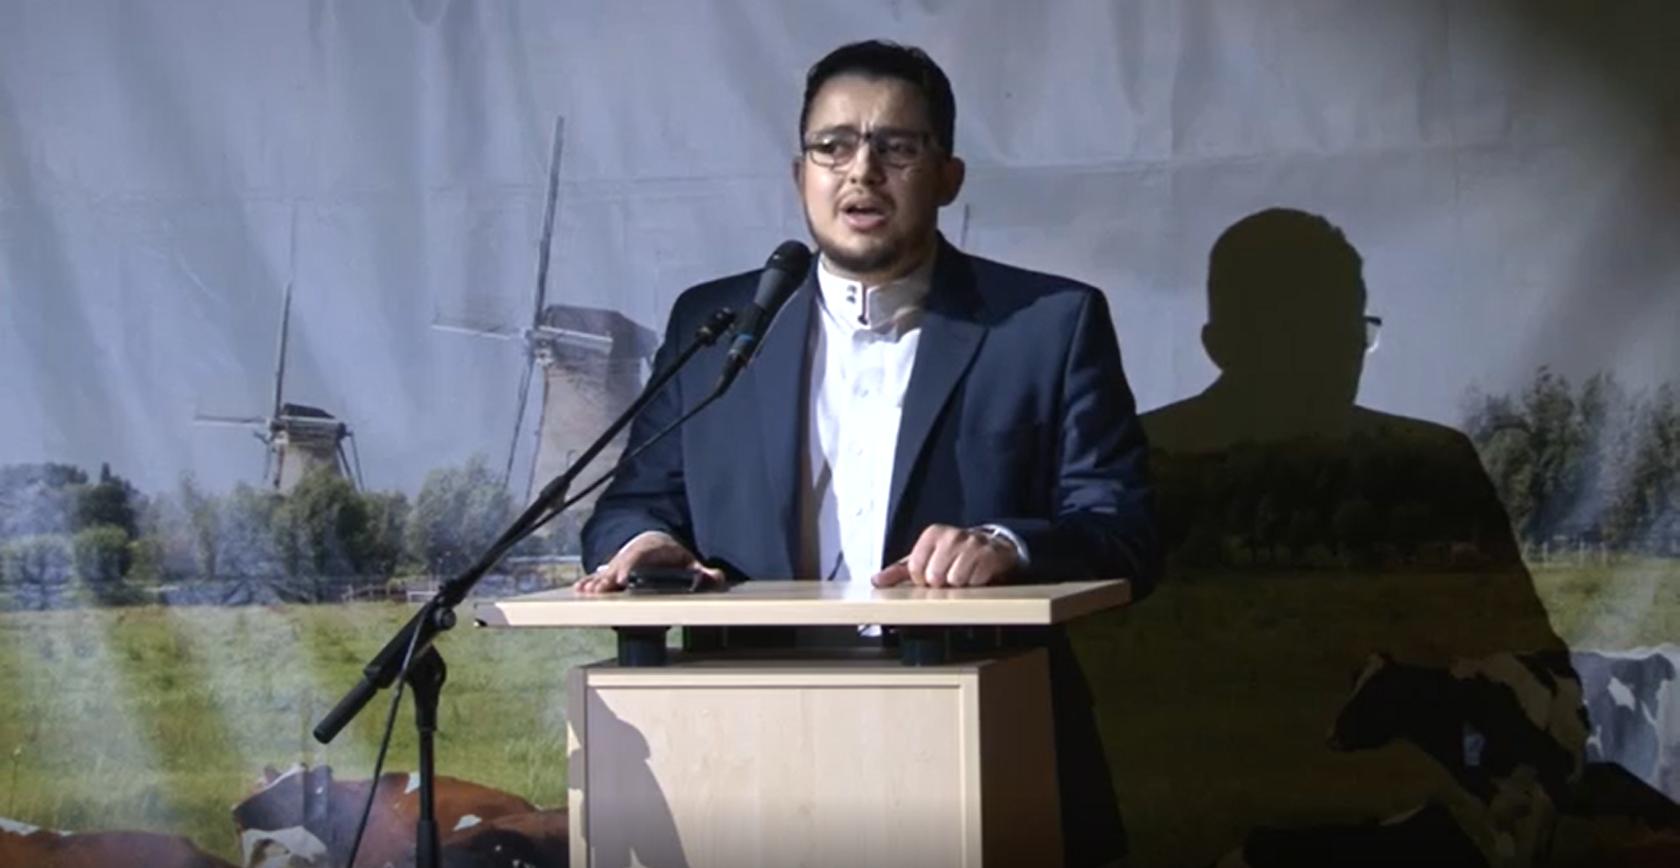 Koranrecitatie Moeqri Mohammed el-Hoceimi - Iftar